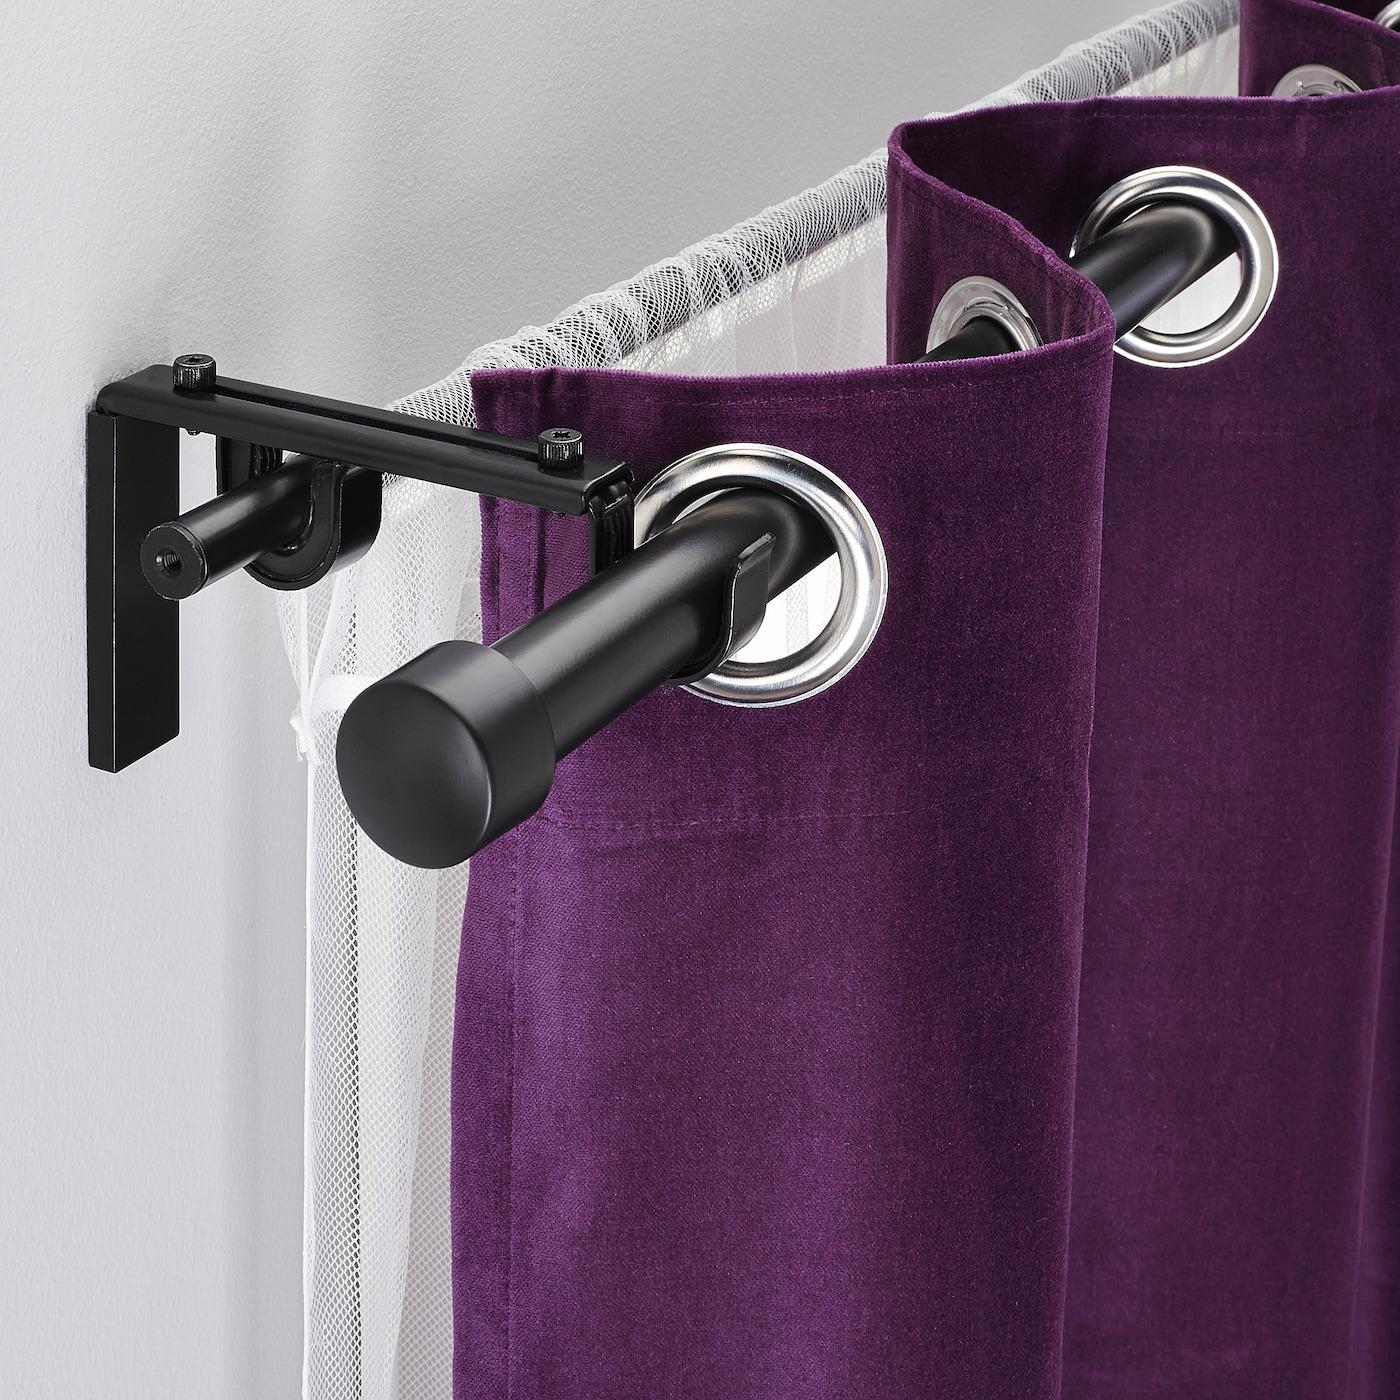 RÄCKA / HUGAD Double curtain rod combination - black 210-385 cm